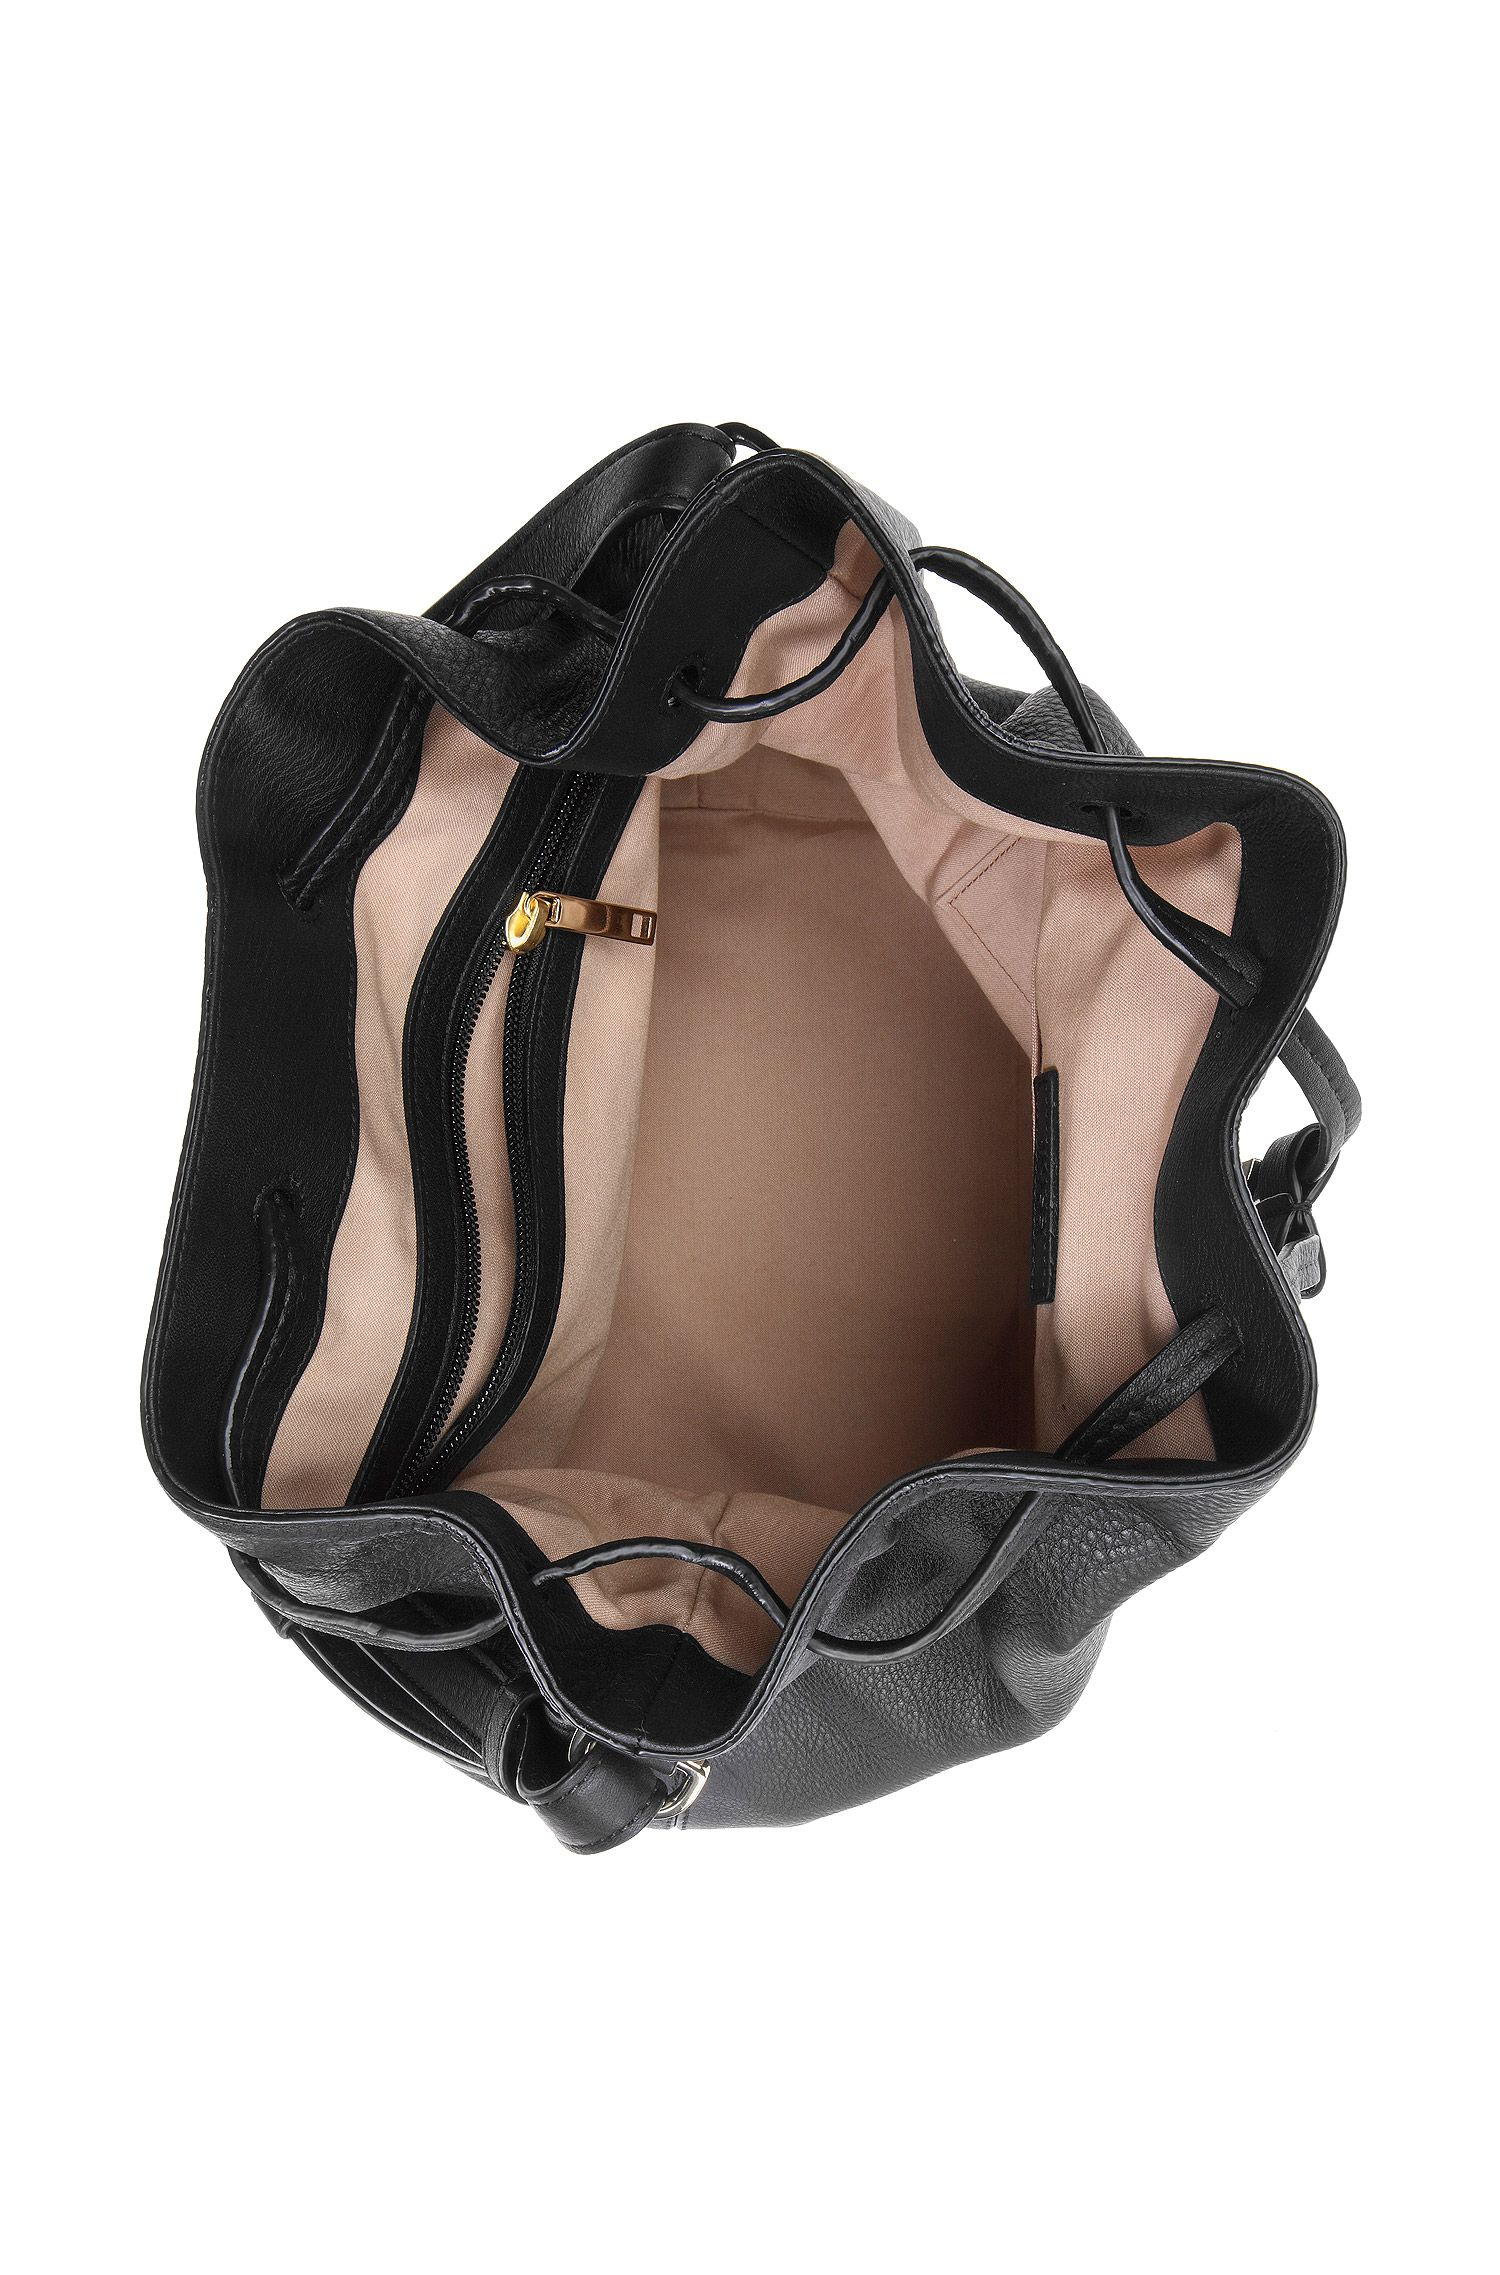 Kordelzugtasche ´Malinda-G` aus Leder